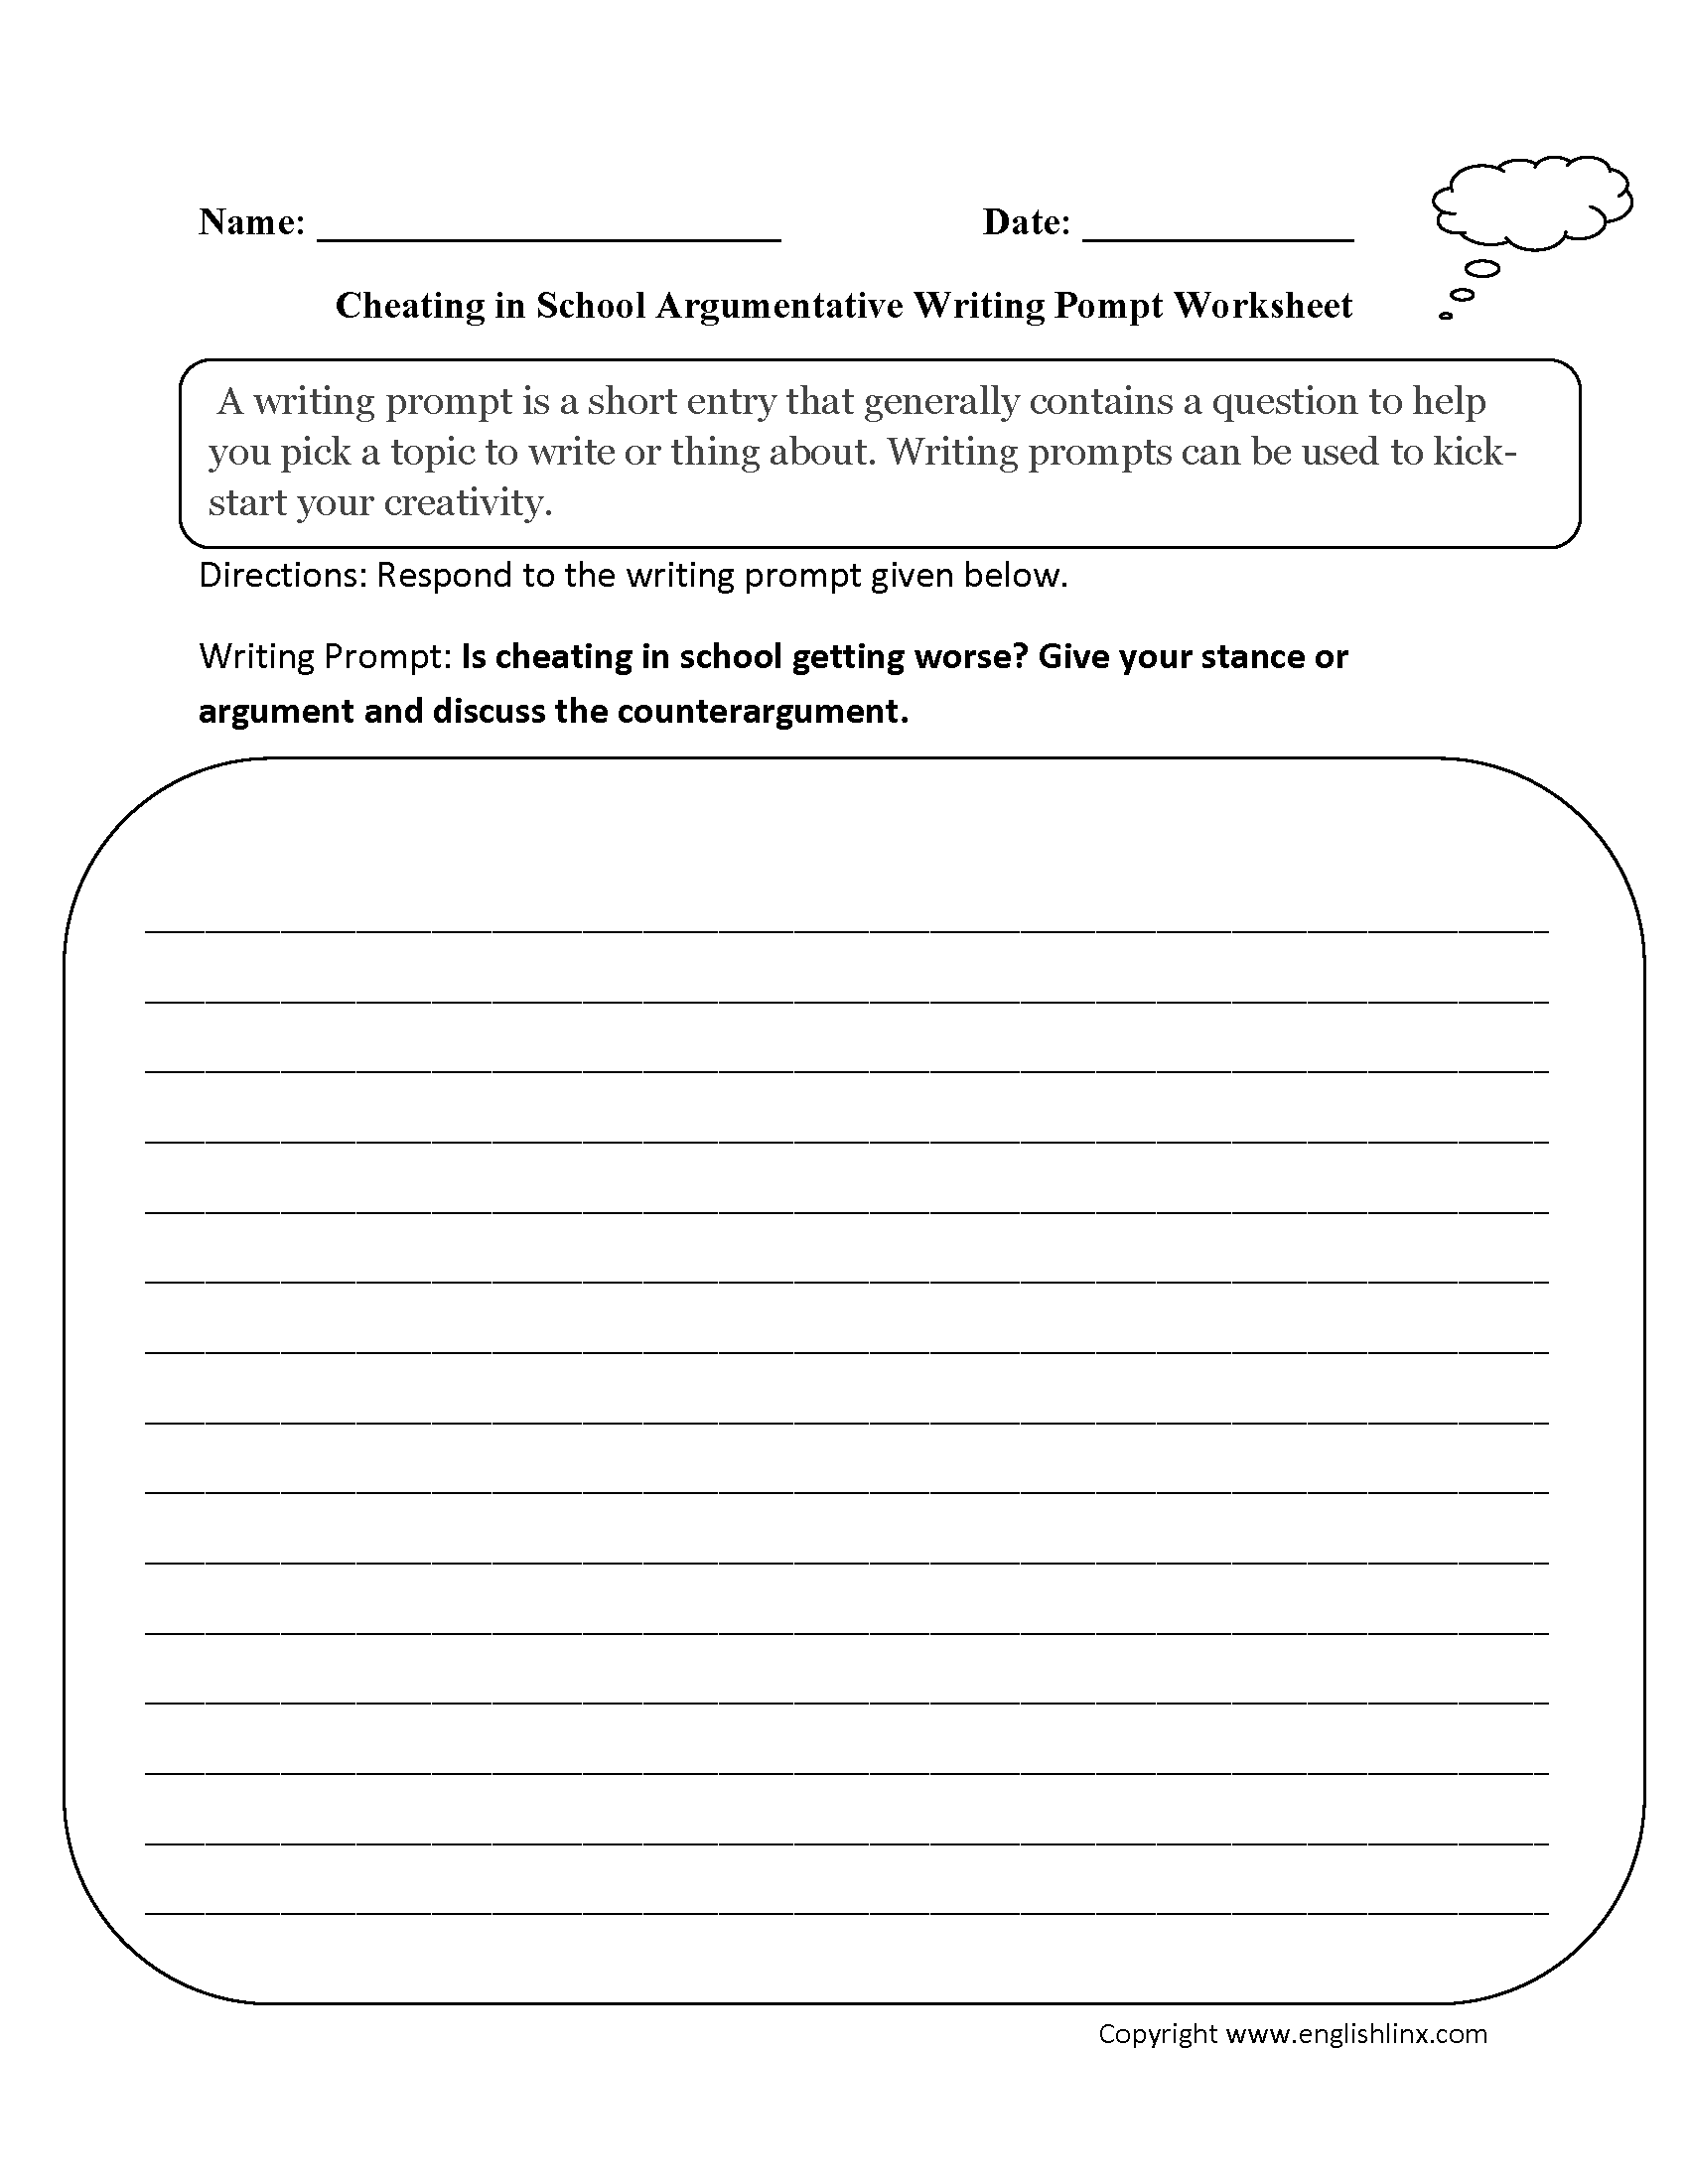 006 6th Grade Argumentative Essay Topics Cheating School Writing Prompts Worksheets Unique Sixth 6 Full